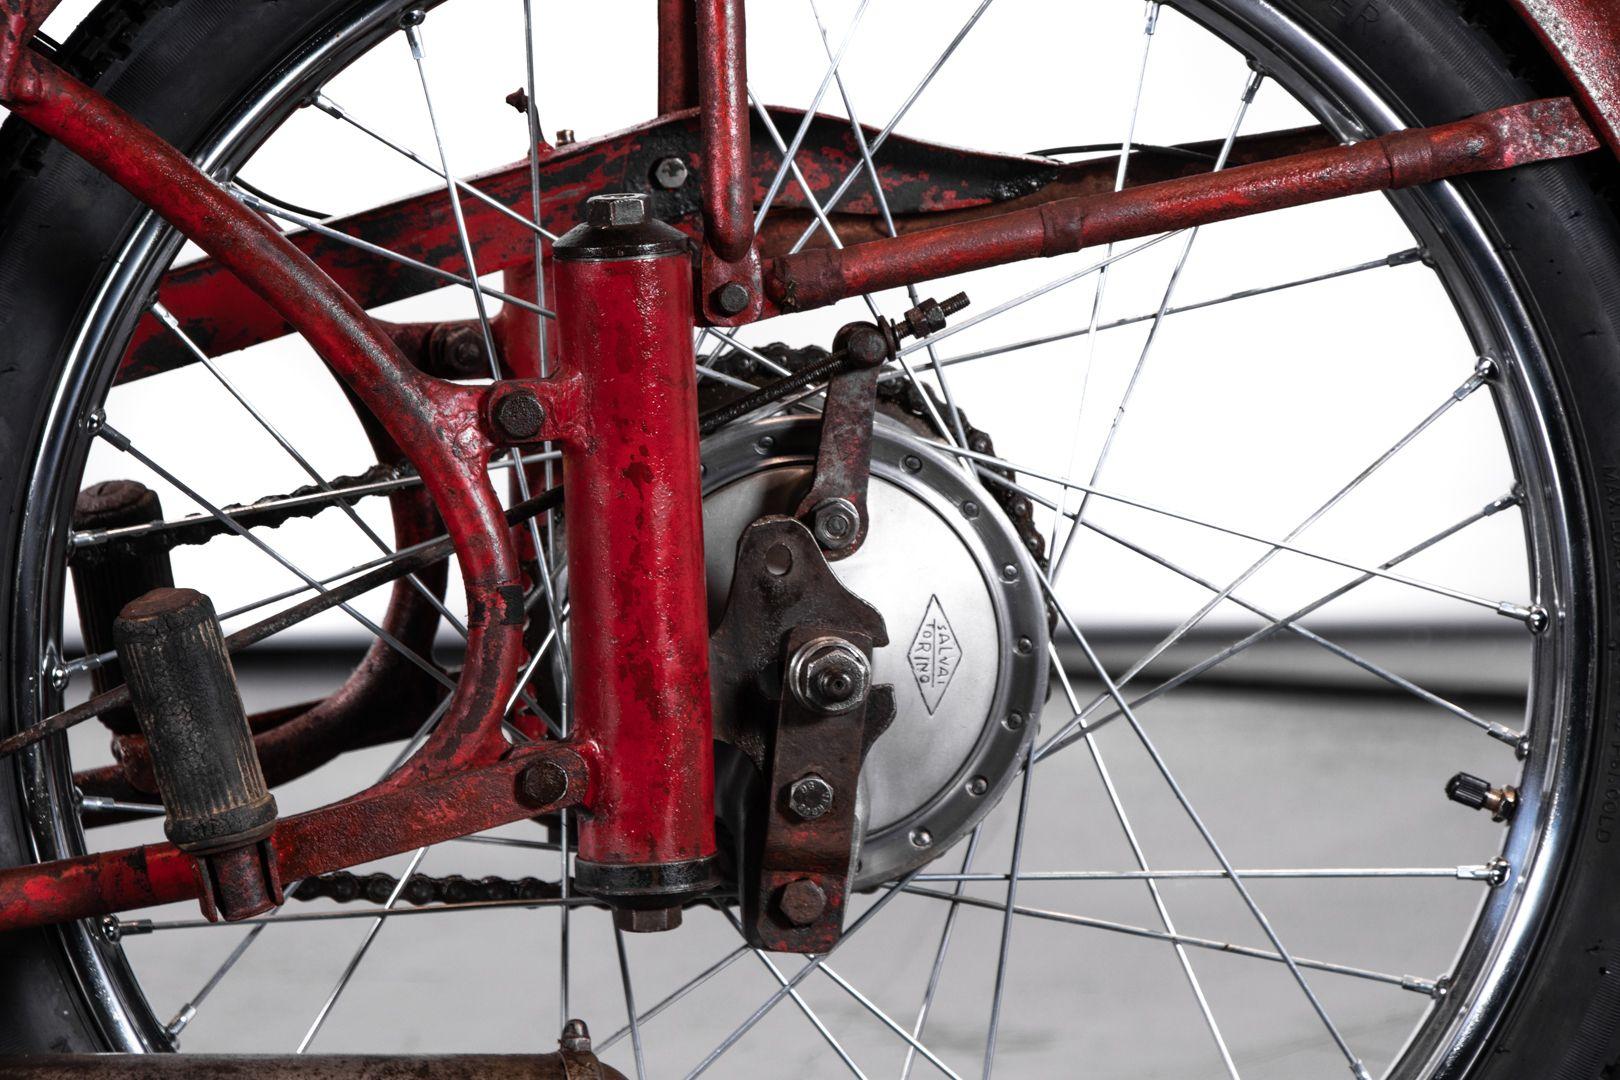 1954 Pirotta 75cc 85030